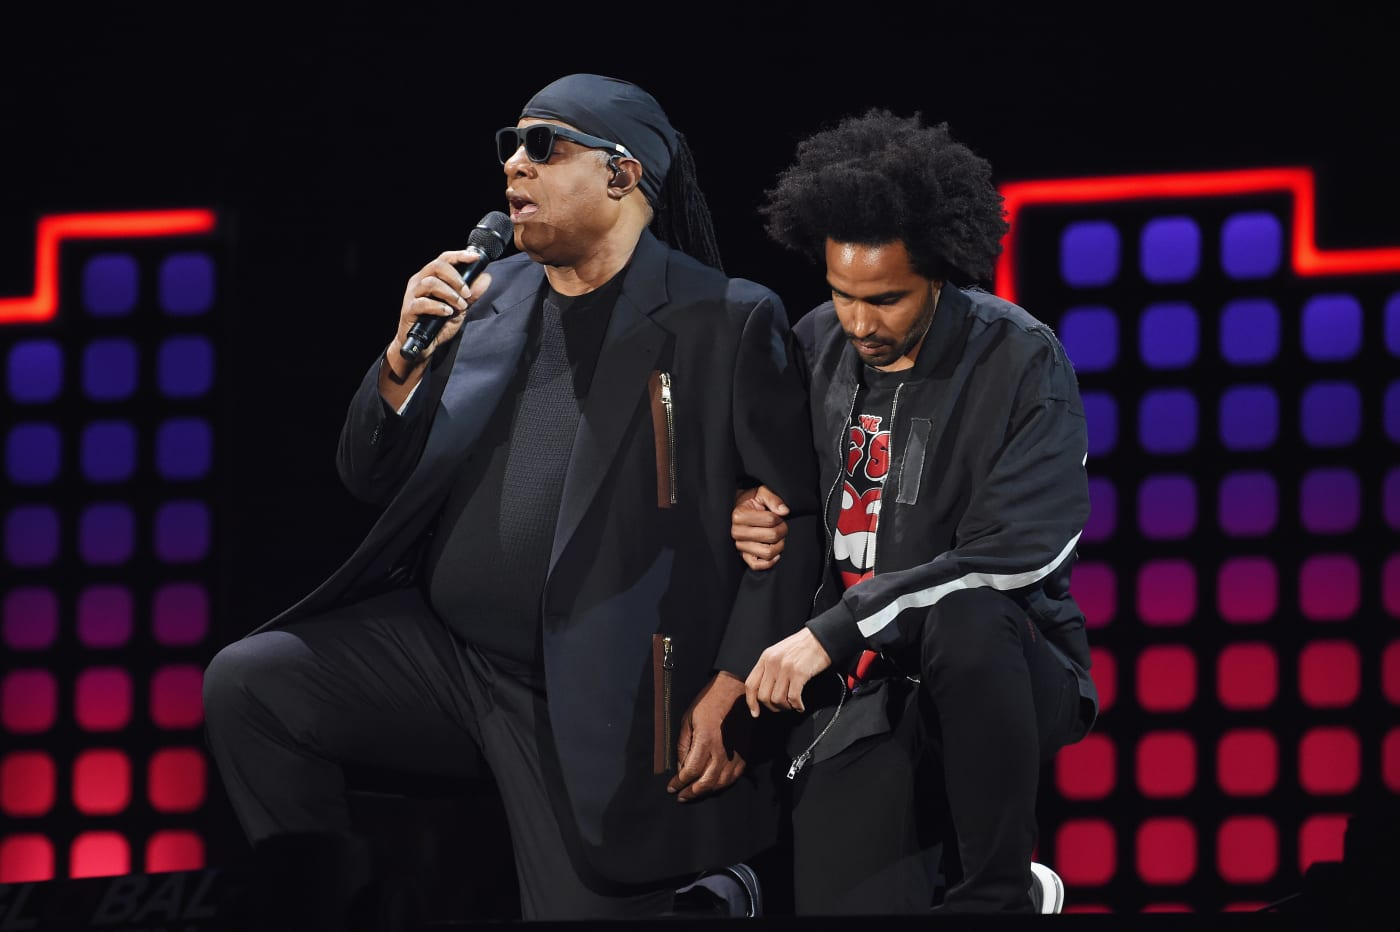 Stevie Wonder Kneels following Trump Comments